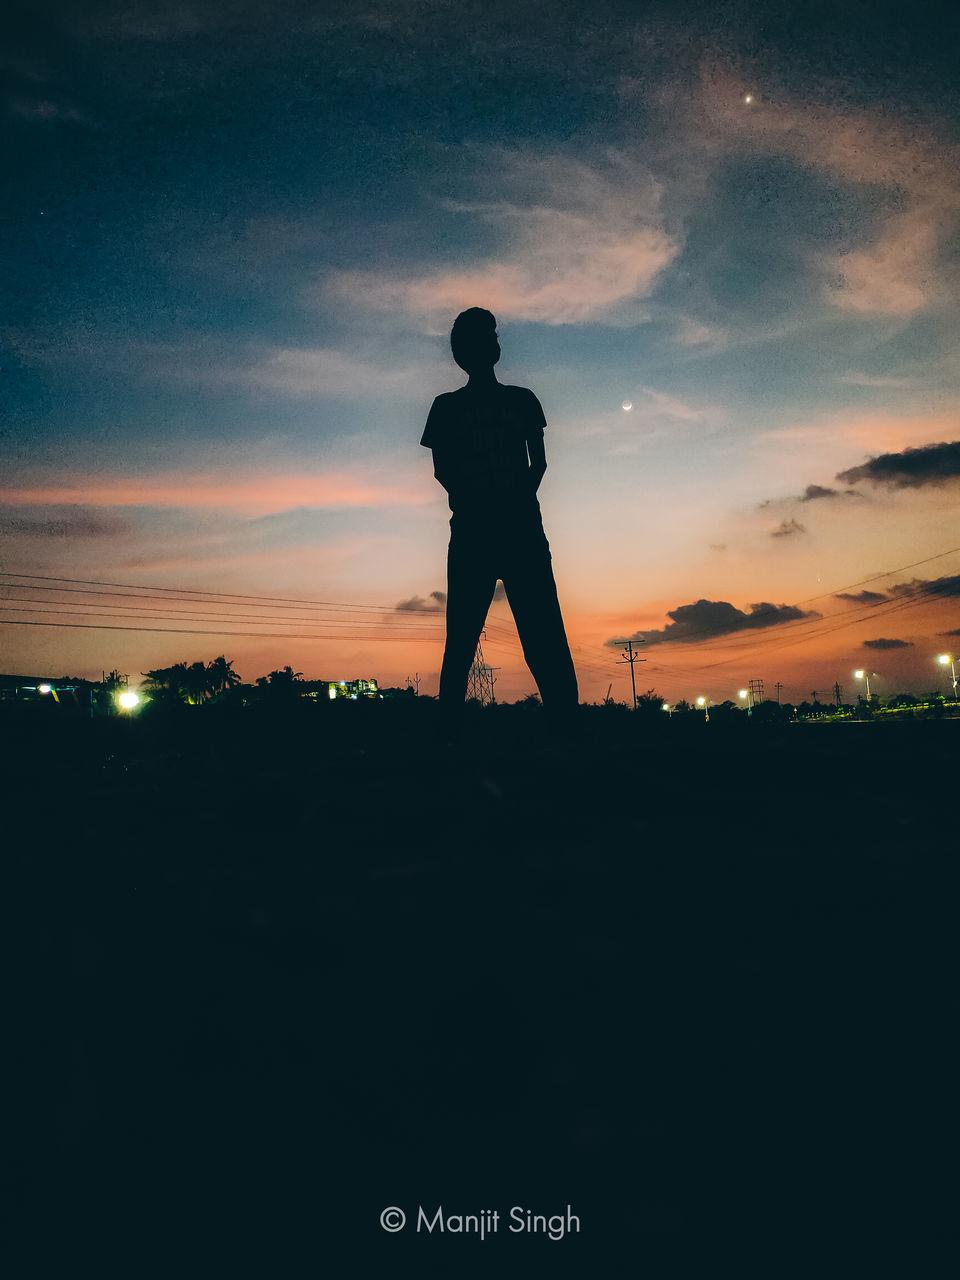 SILHOUETTE MAN STANDING ON FIELD AGAINST ORANGE SKY